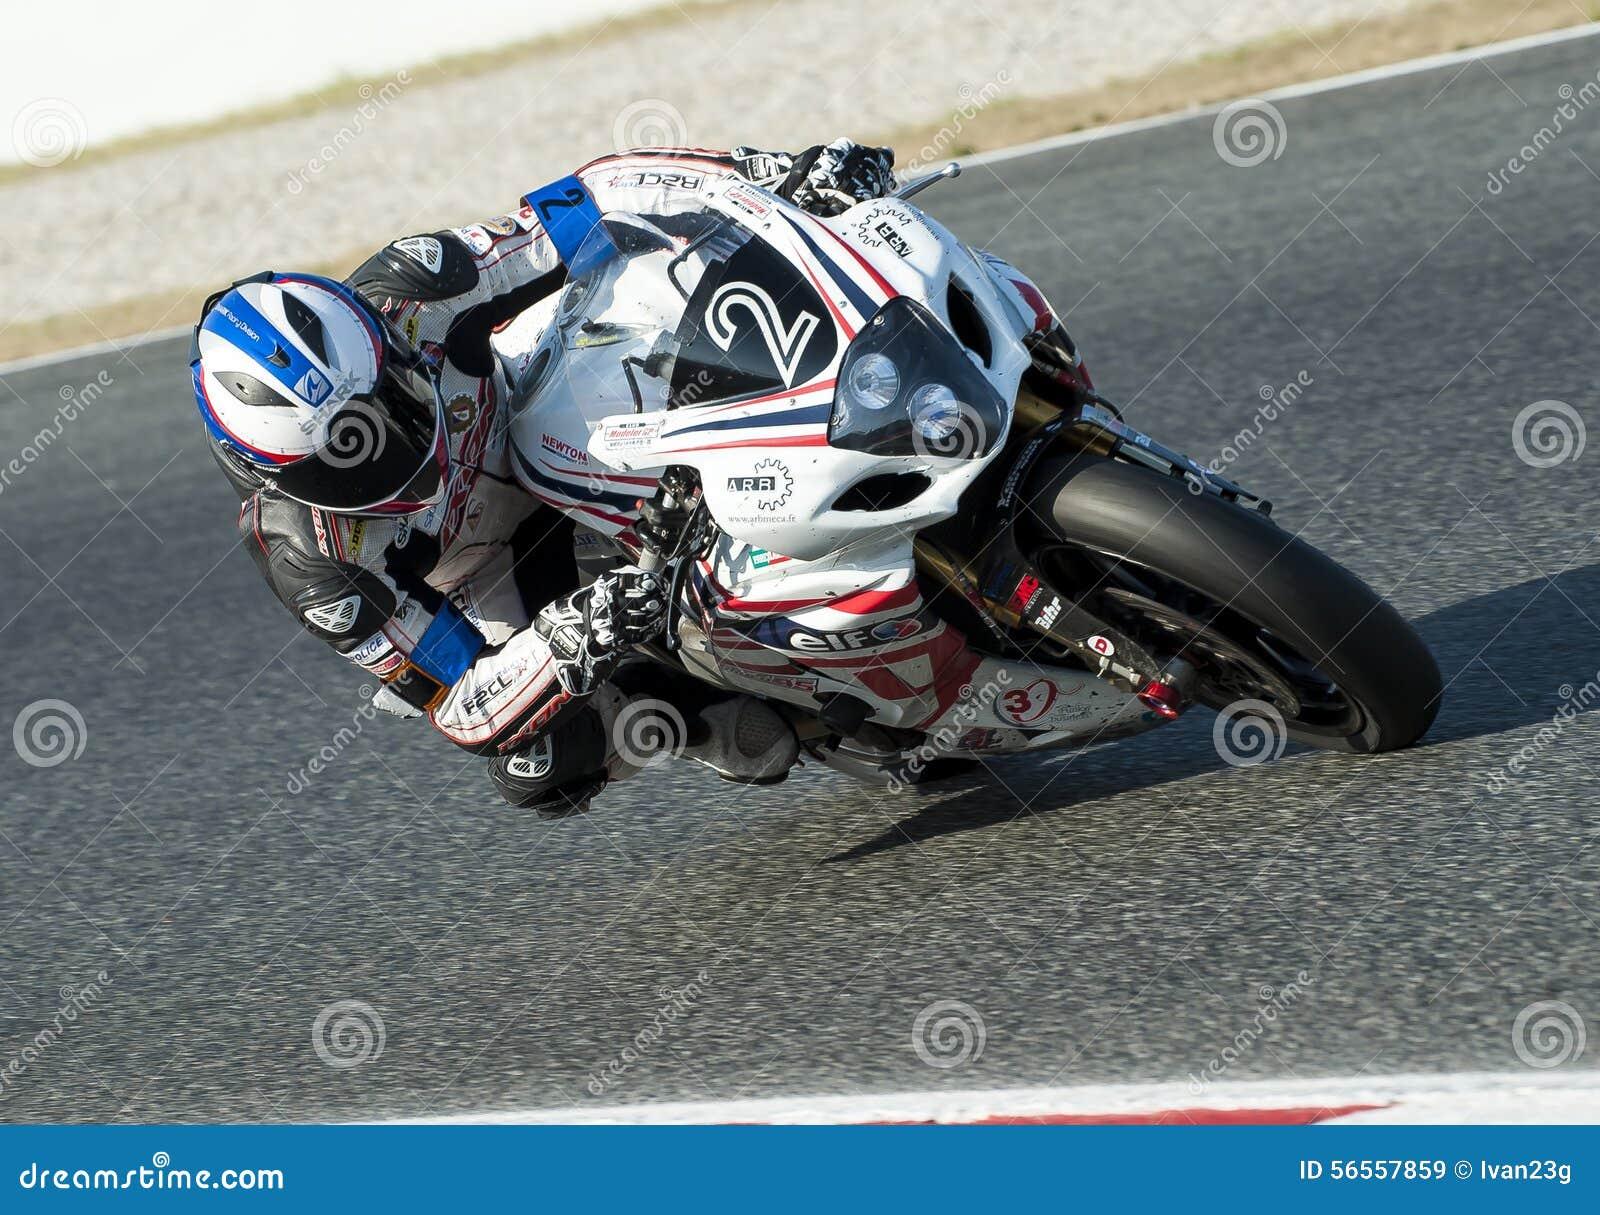 Download 24 ΑΝΤΟΧΗ ΩΡΩΝ MOTORCYCLING ΤΗΣ ΒΑΡΚΕΛΩΝΗΣ Εκδοτική Στοκ Εικόνα - εικόνα από μοτοσικλέτα, πρωτοπόρος: 56557859